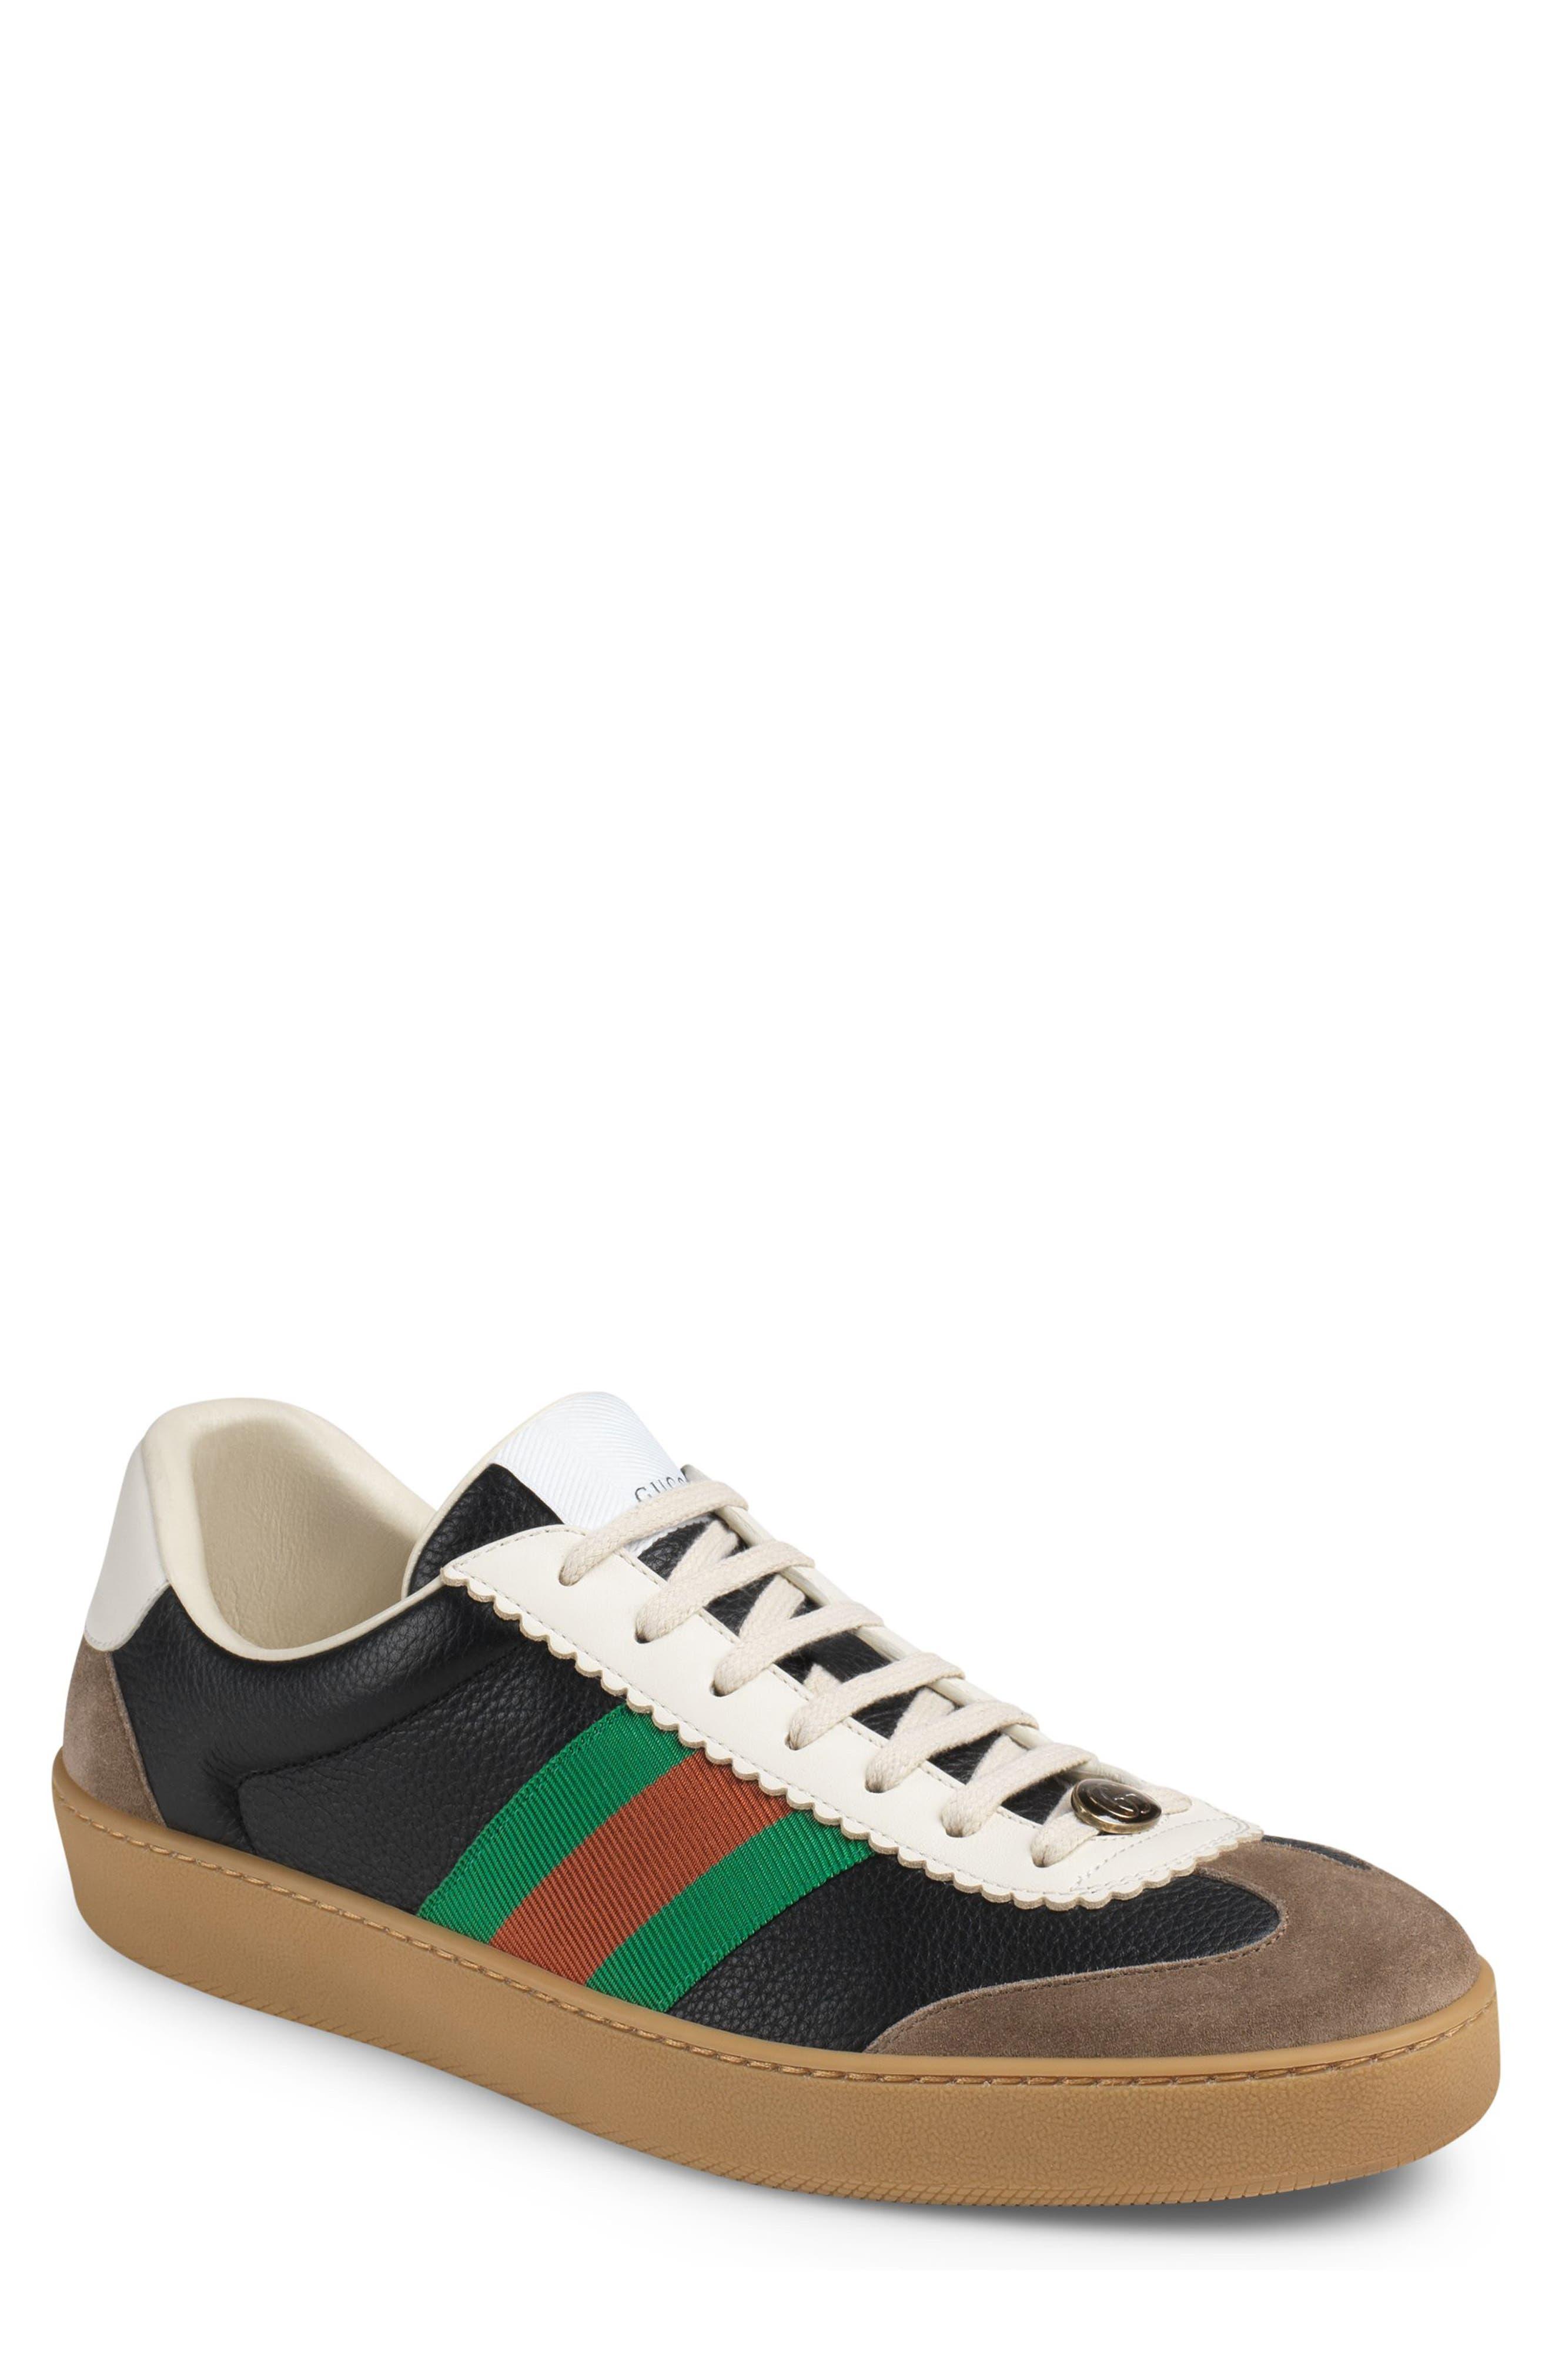 Web Sneaker,                             Main thumbnail 1, color,                             ARDESIA/ BLACK